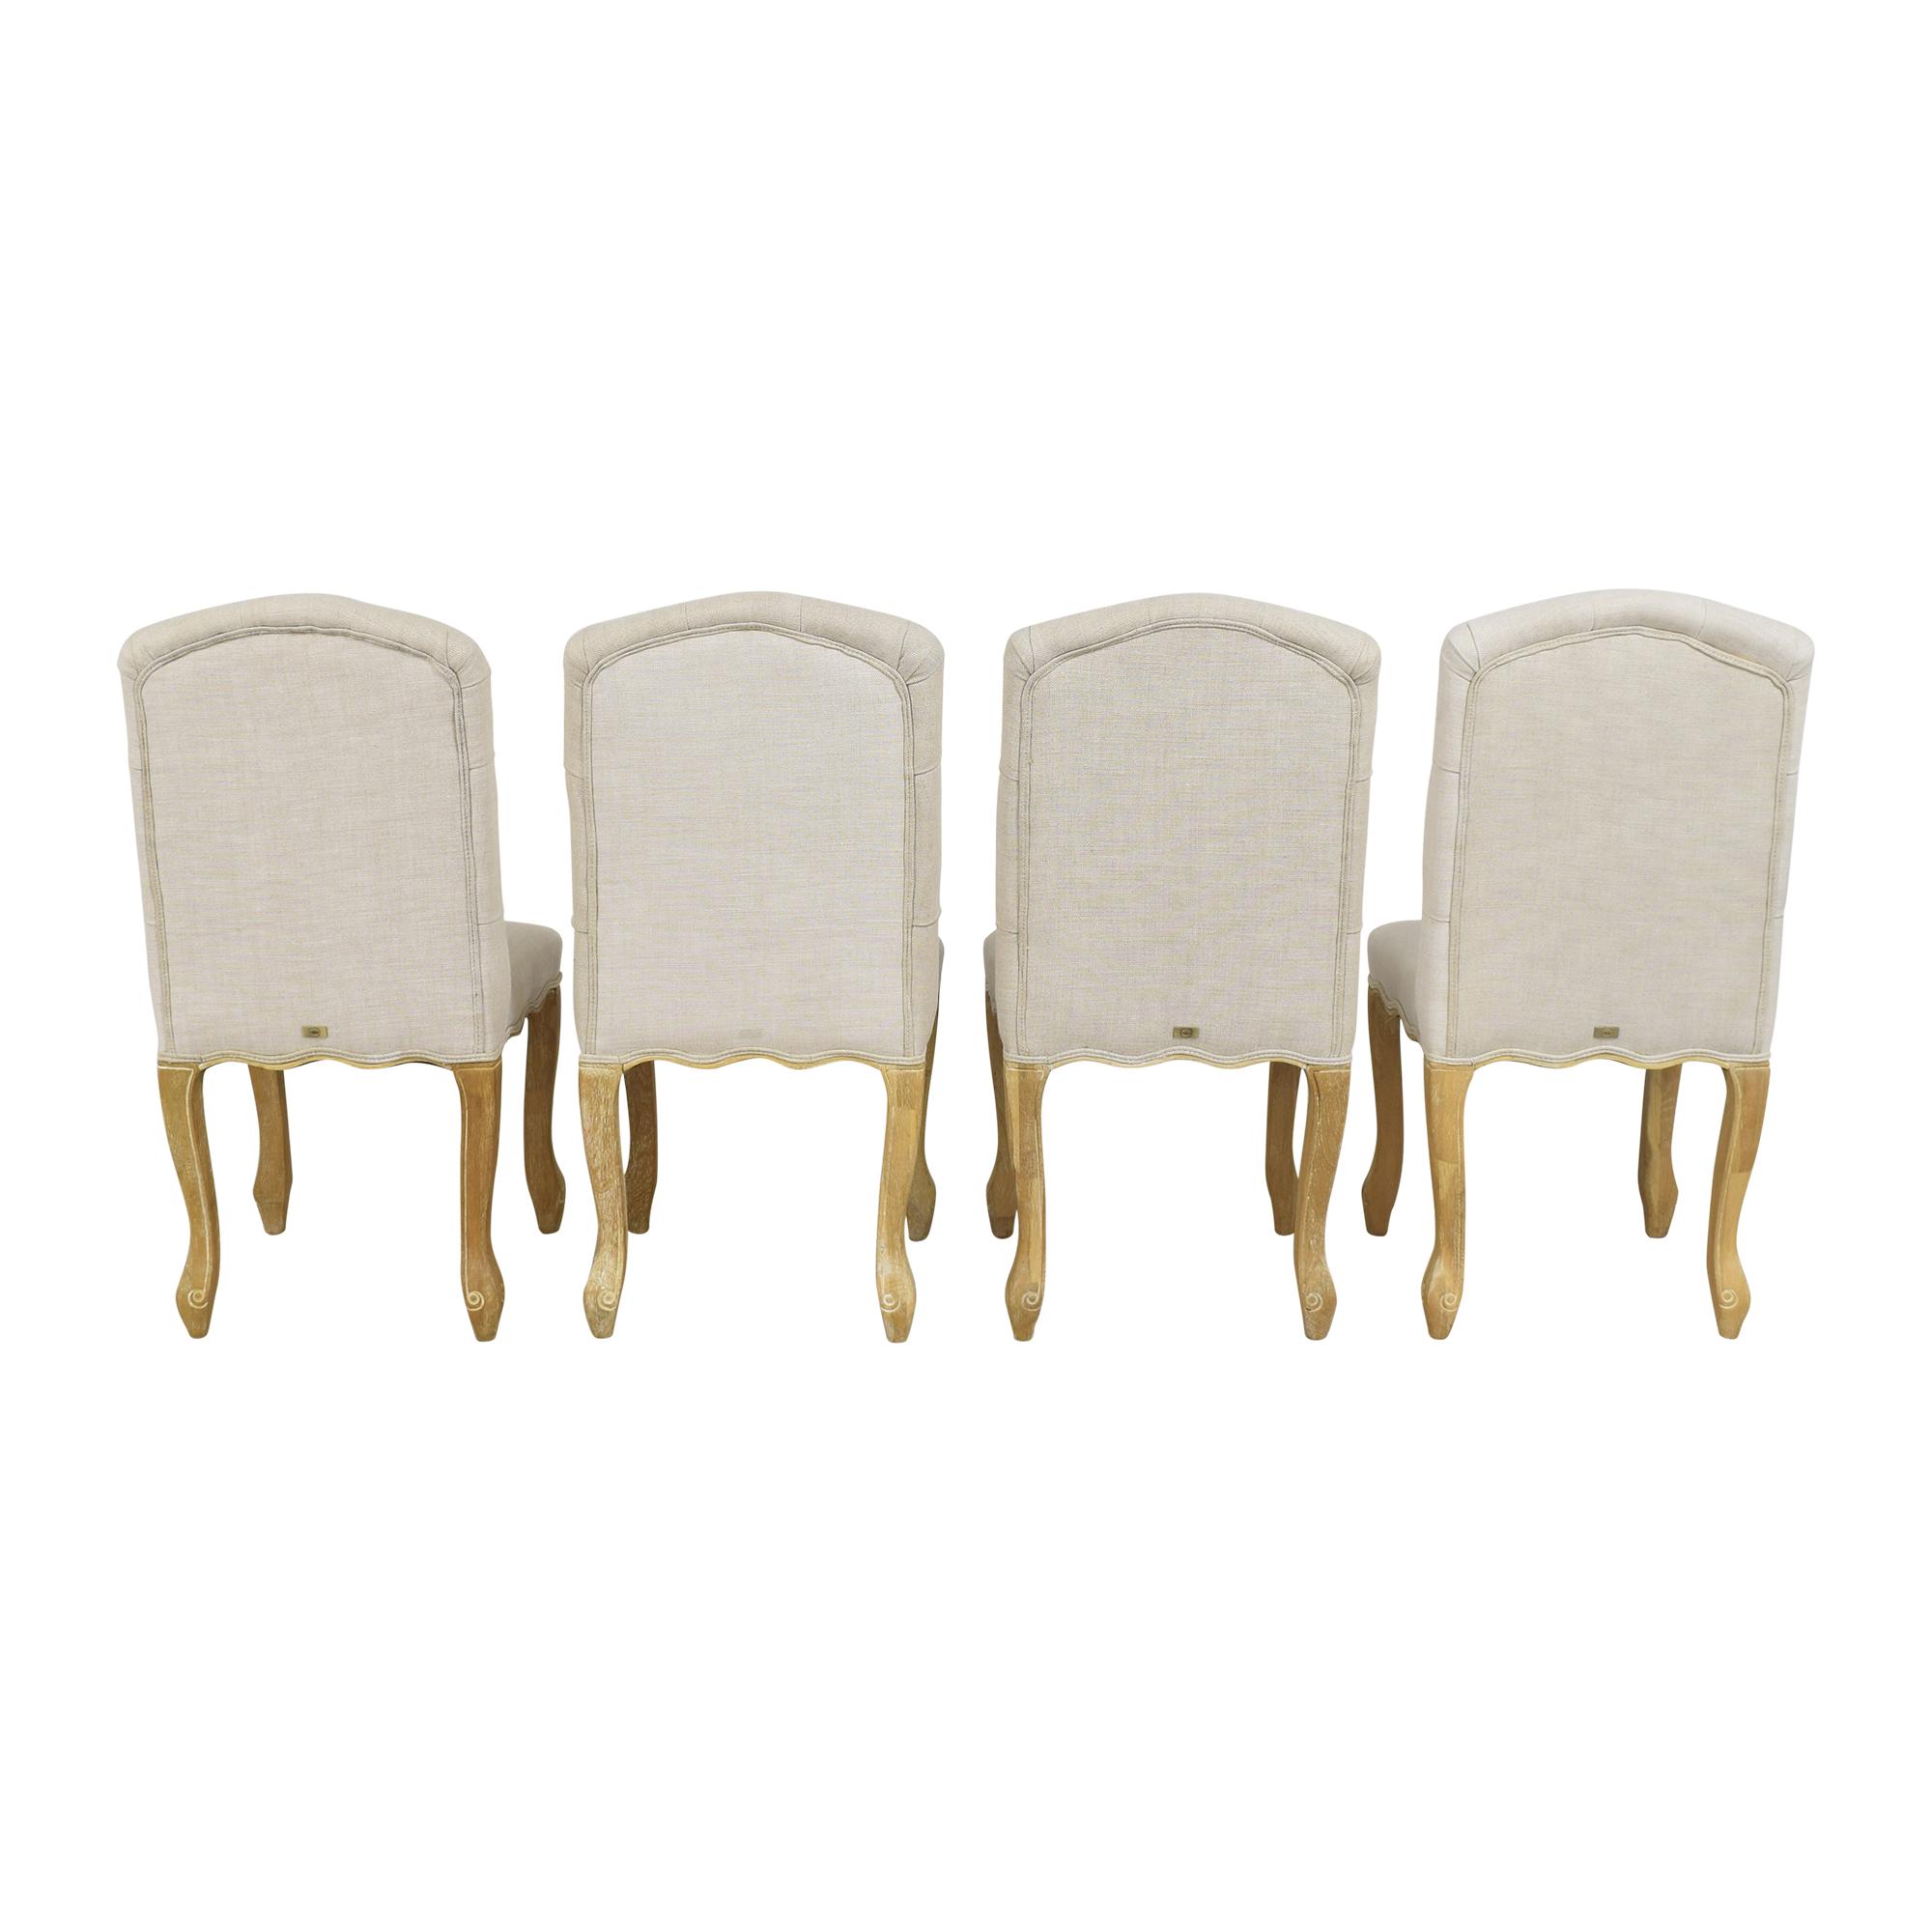 Zuo Modern Zuo Modern Noe Valley Chairs on sale